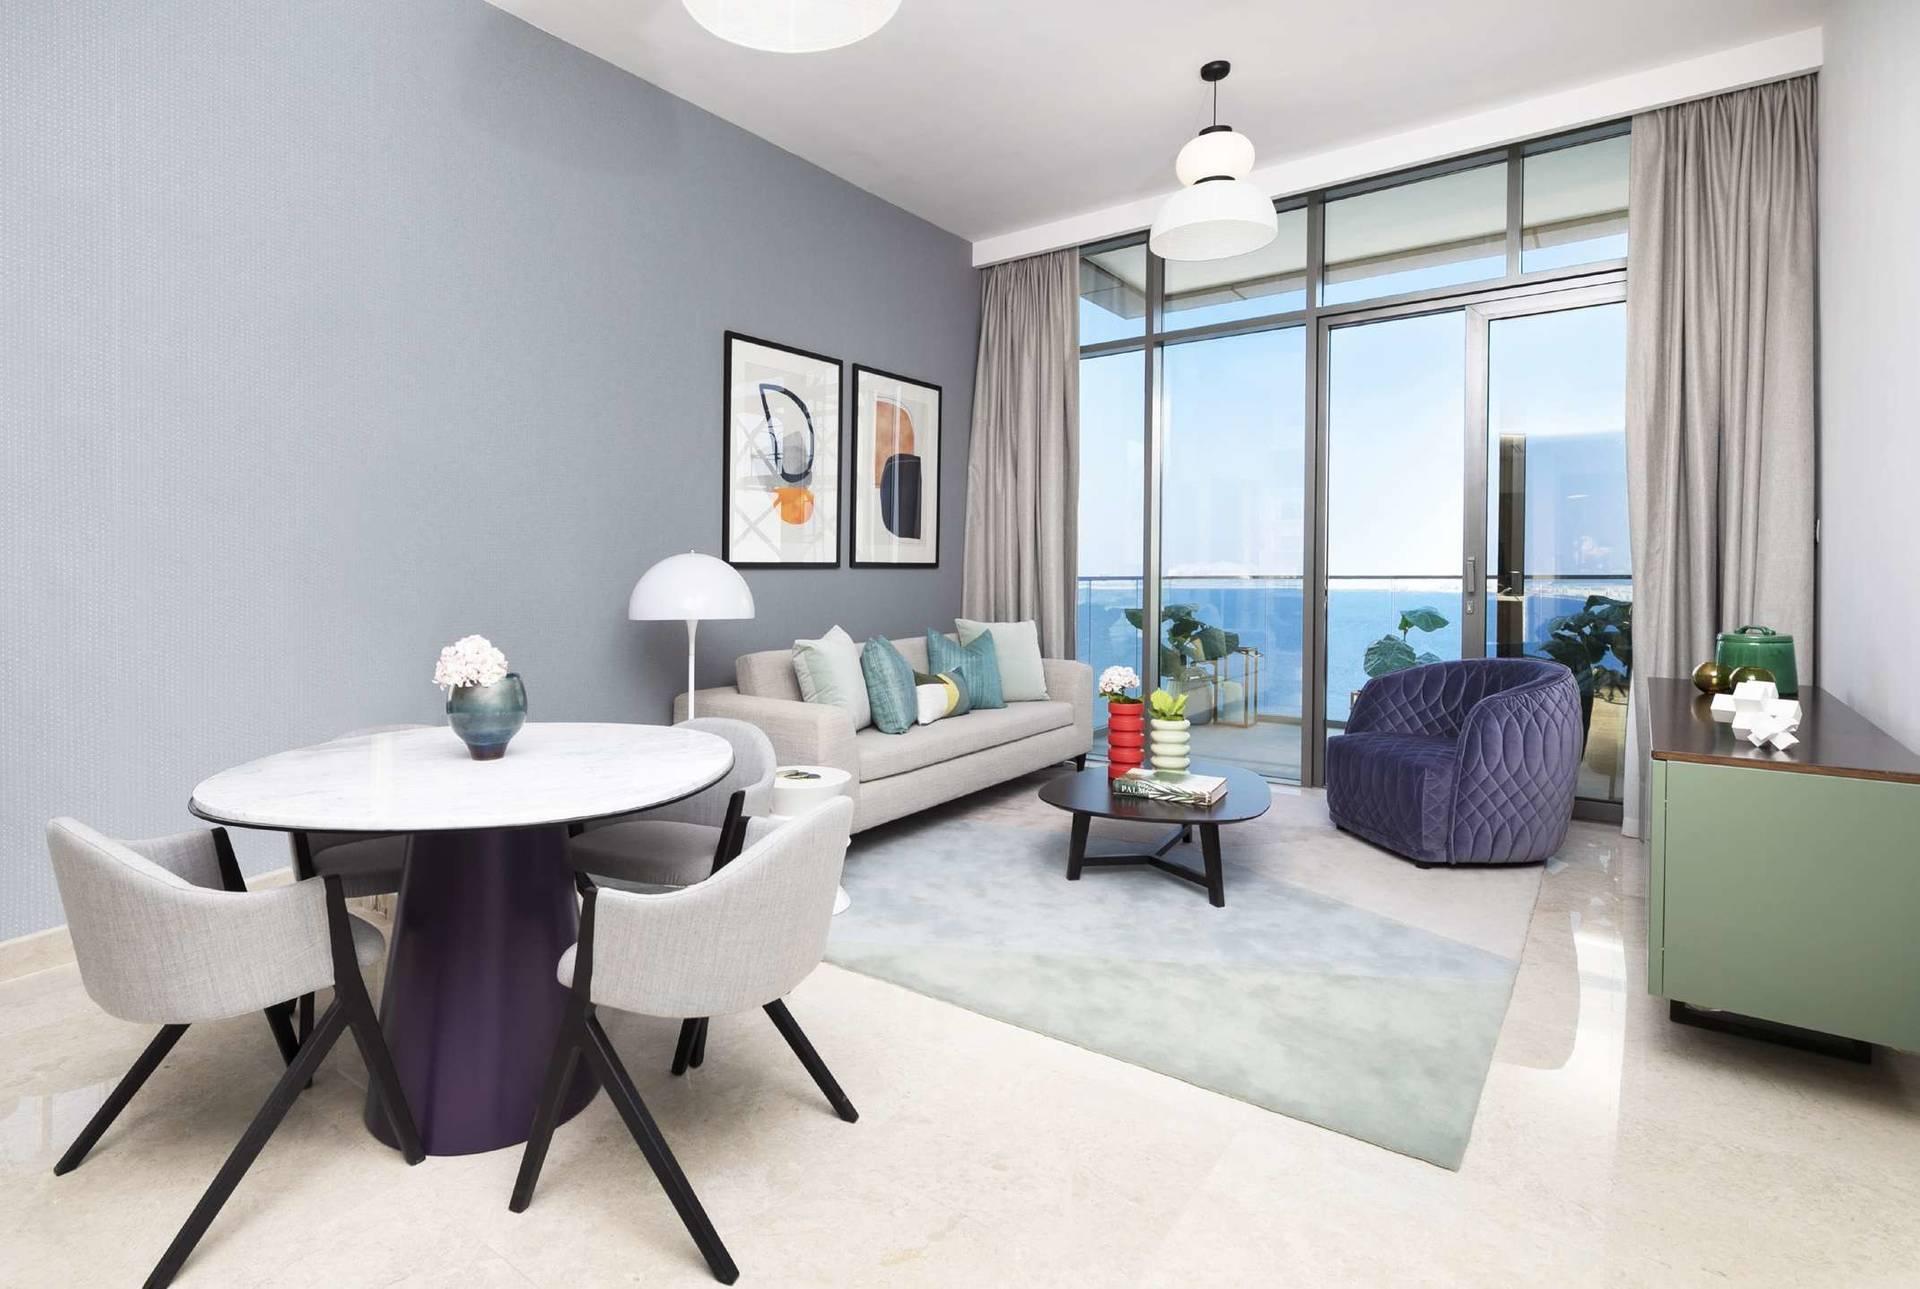 Апартаменты, sale в ANWA Дубай, ОАЭ